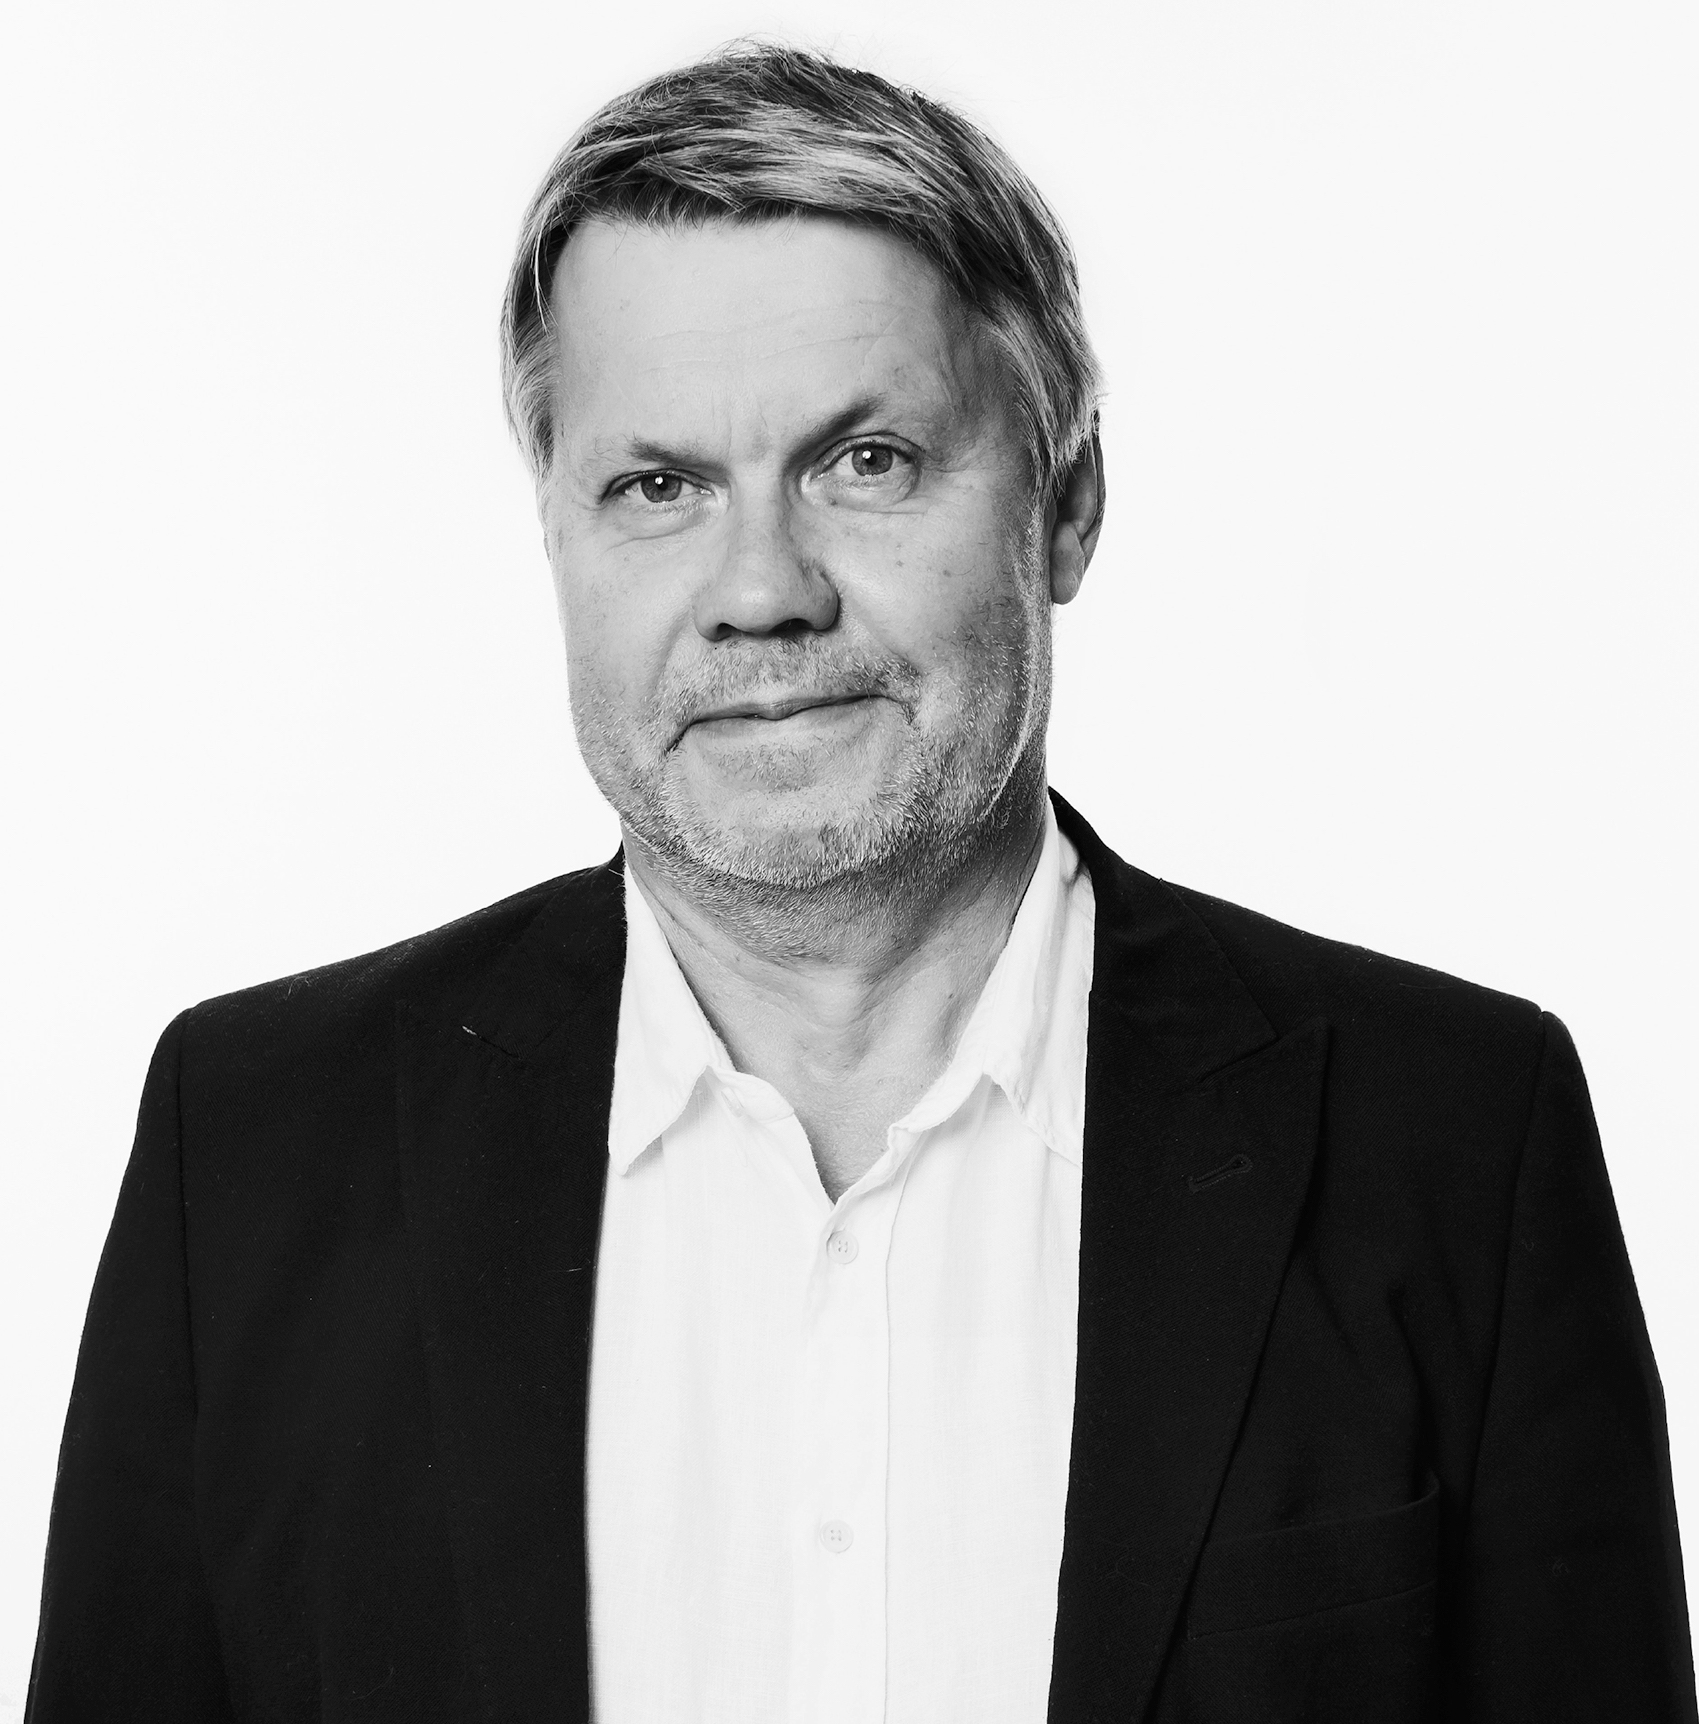 Tomas Camnell, Styrelseledamot på MTF. Foto: Privat